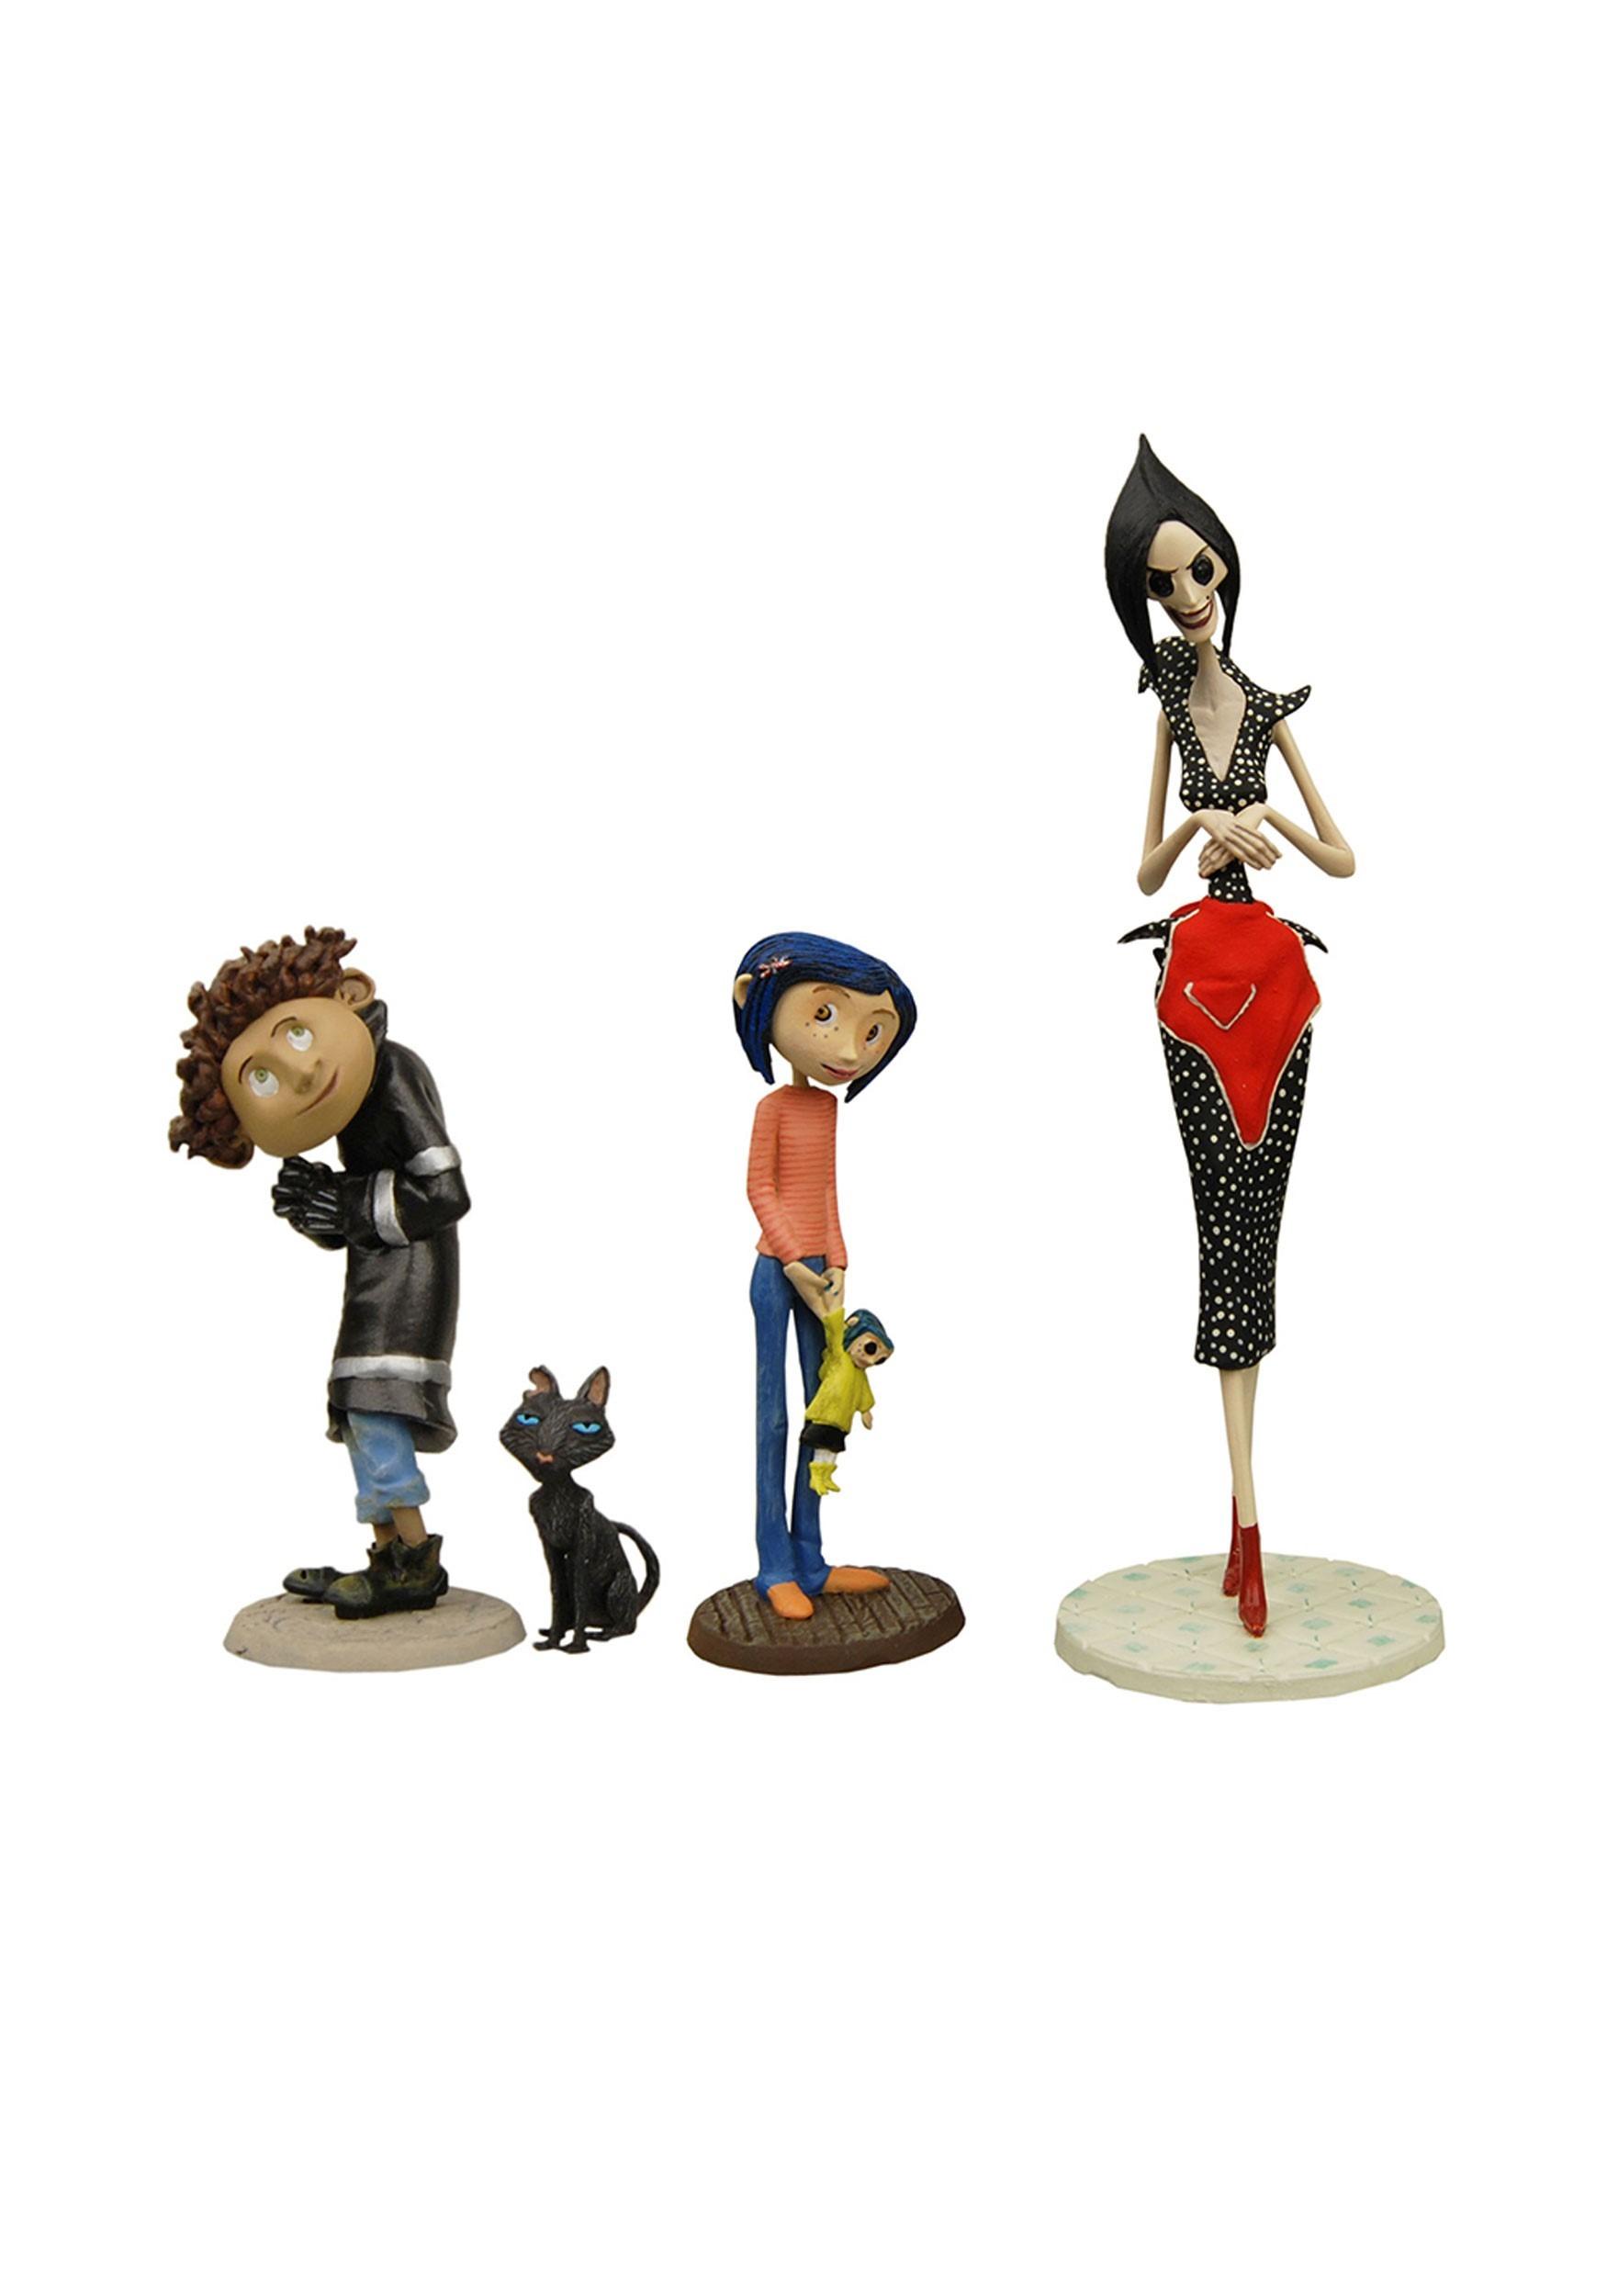 Coraline 3 Pvc Figures Set